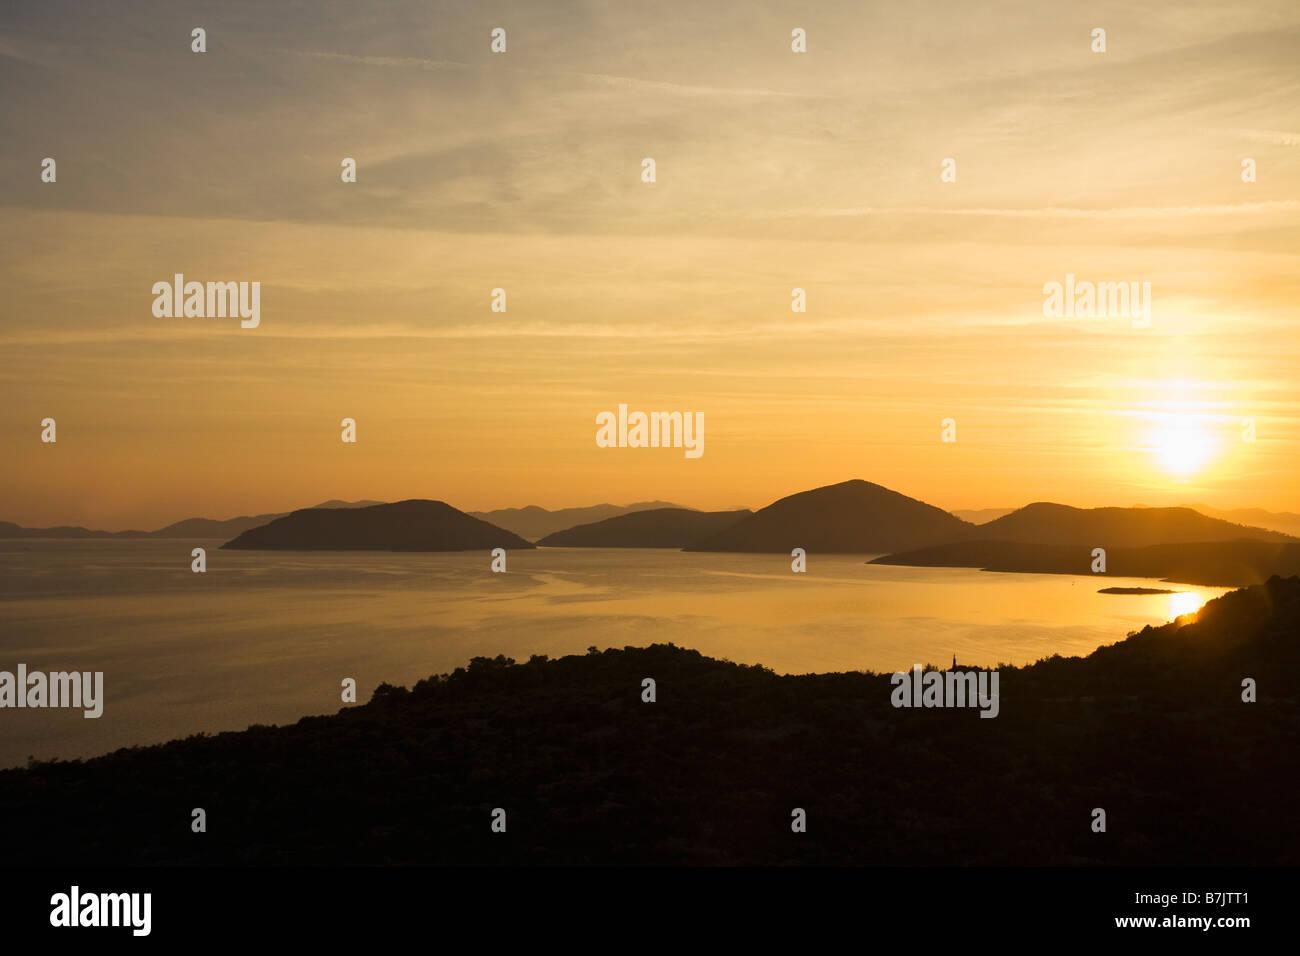 Sunset over the Dalmatian Coast near Dubrovnik Croatia Europe - Stock Image